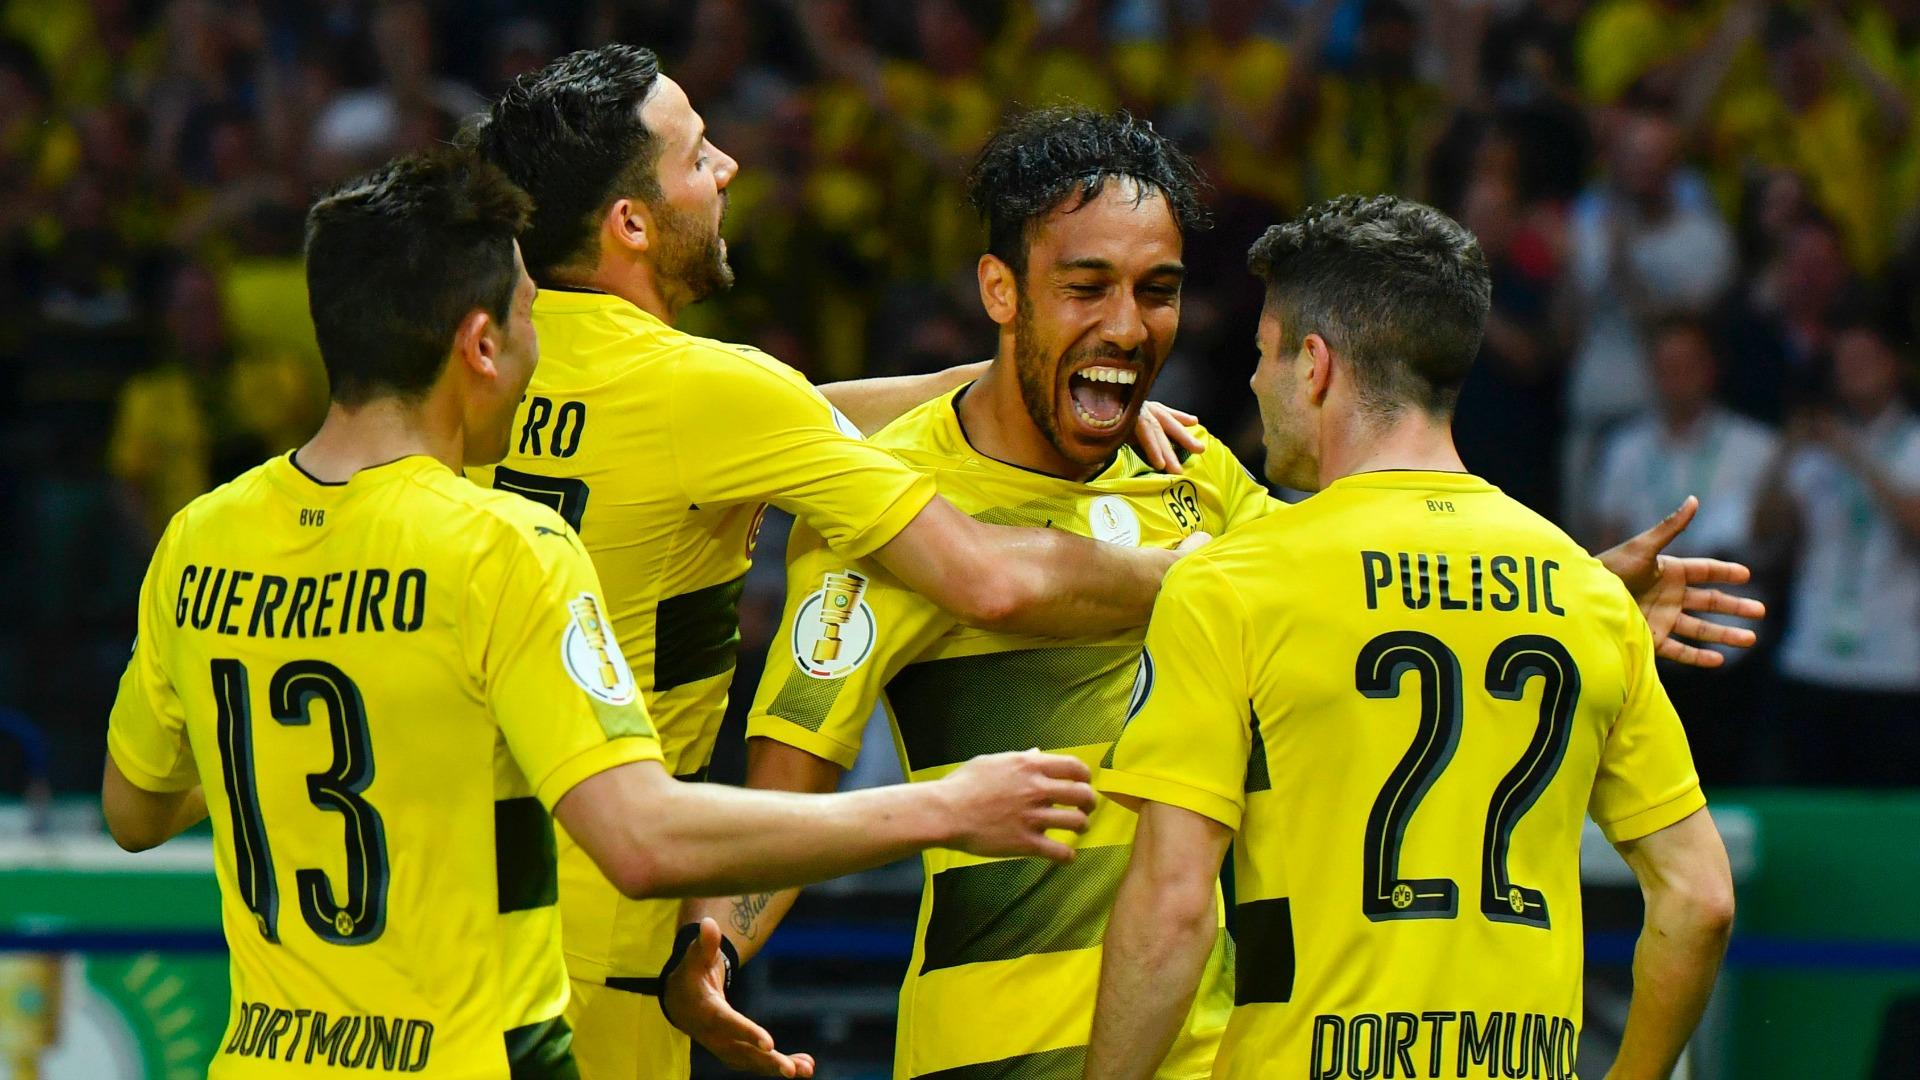 Borussia Dortmund celebrating Eintracht Borussia Dortmund